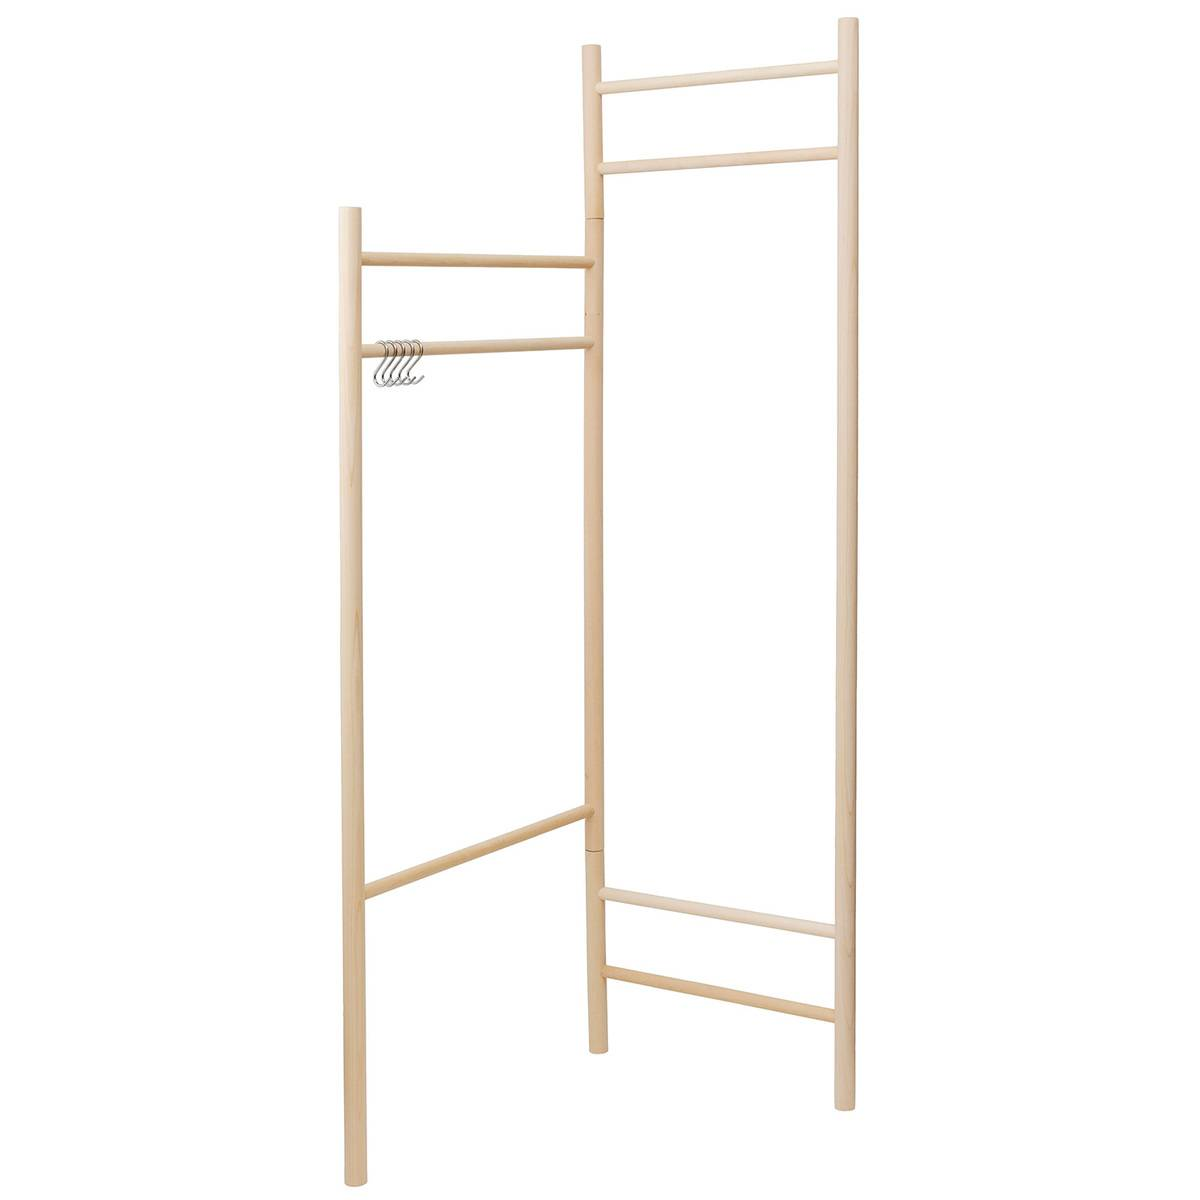 Verso Design Tikas clothes rack, birch